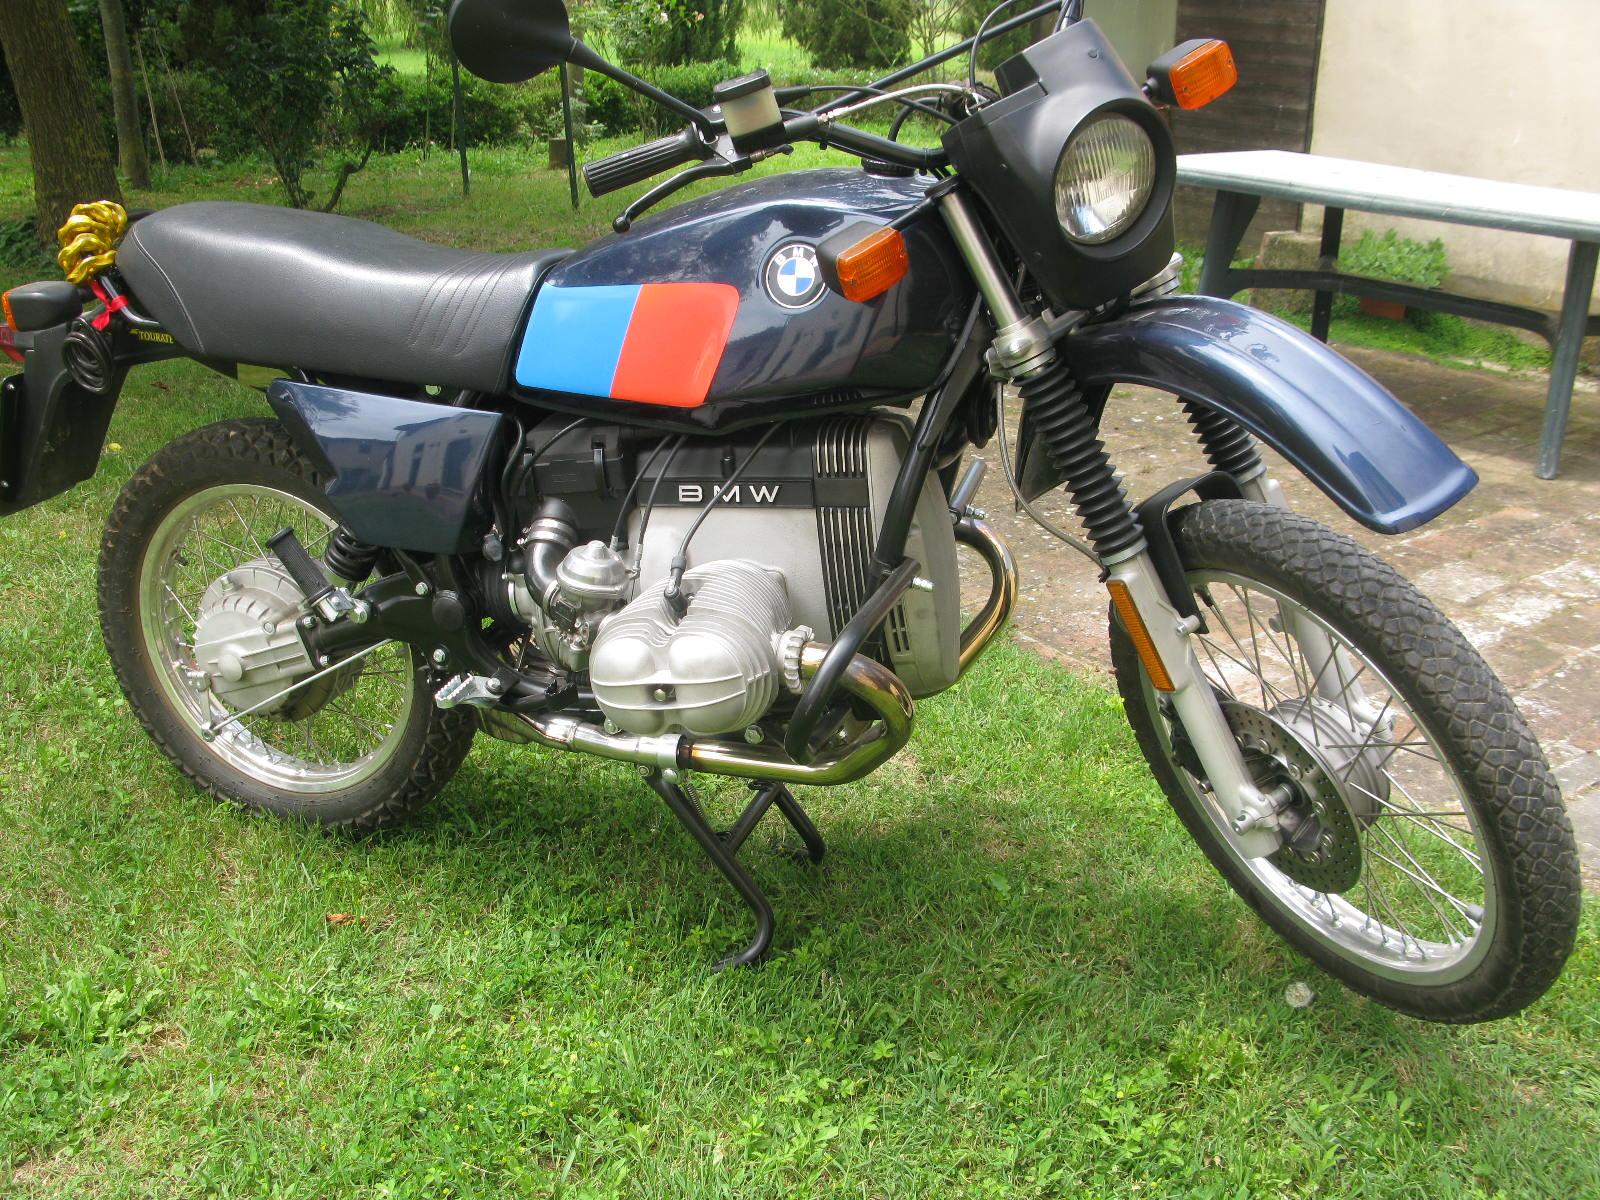 Ricambi per moto bmw r100rs gianni garage castelfiorentino - Garage moto bmw belgique ...